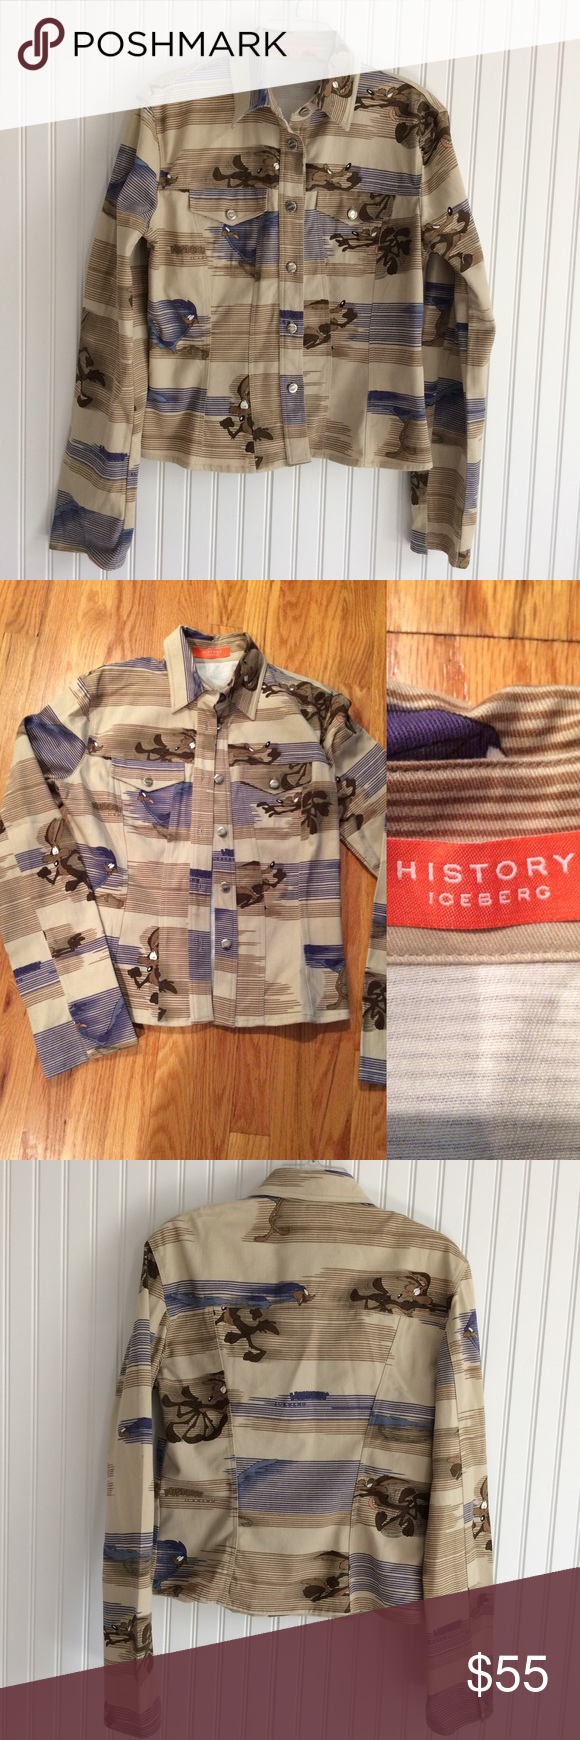 Vintage History Iceberg Wile E Coyote Jacket Clothes Design Fashion Fashion Design [ 1740 x 580 Pixel ]